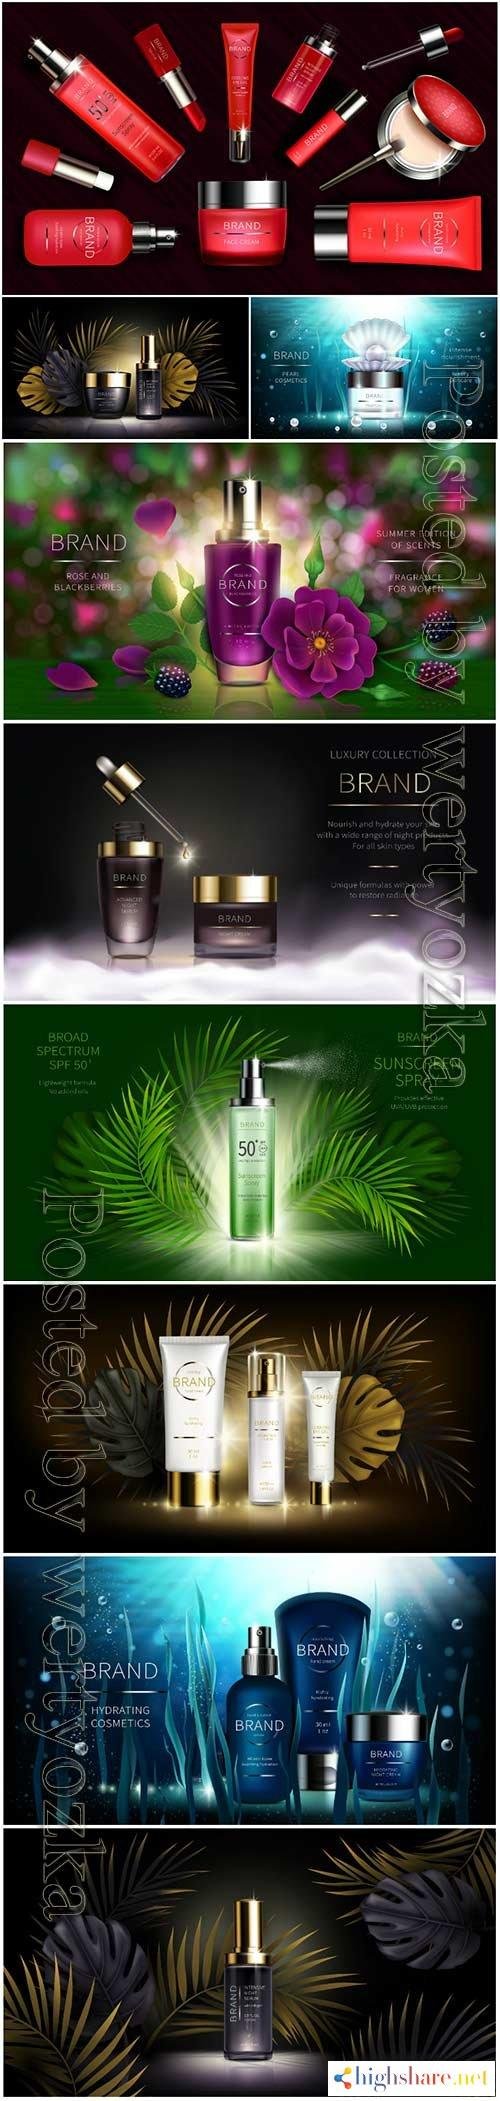 skin care cosmetics vector illustration 5f3ffc5a0c2fa - Skin care cosmetics, vector illustration